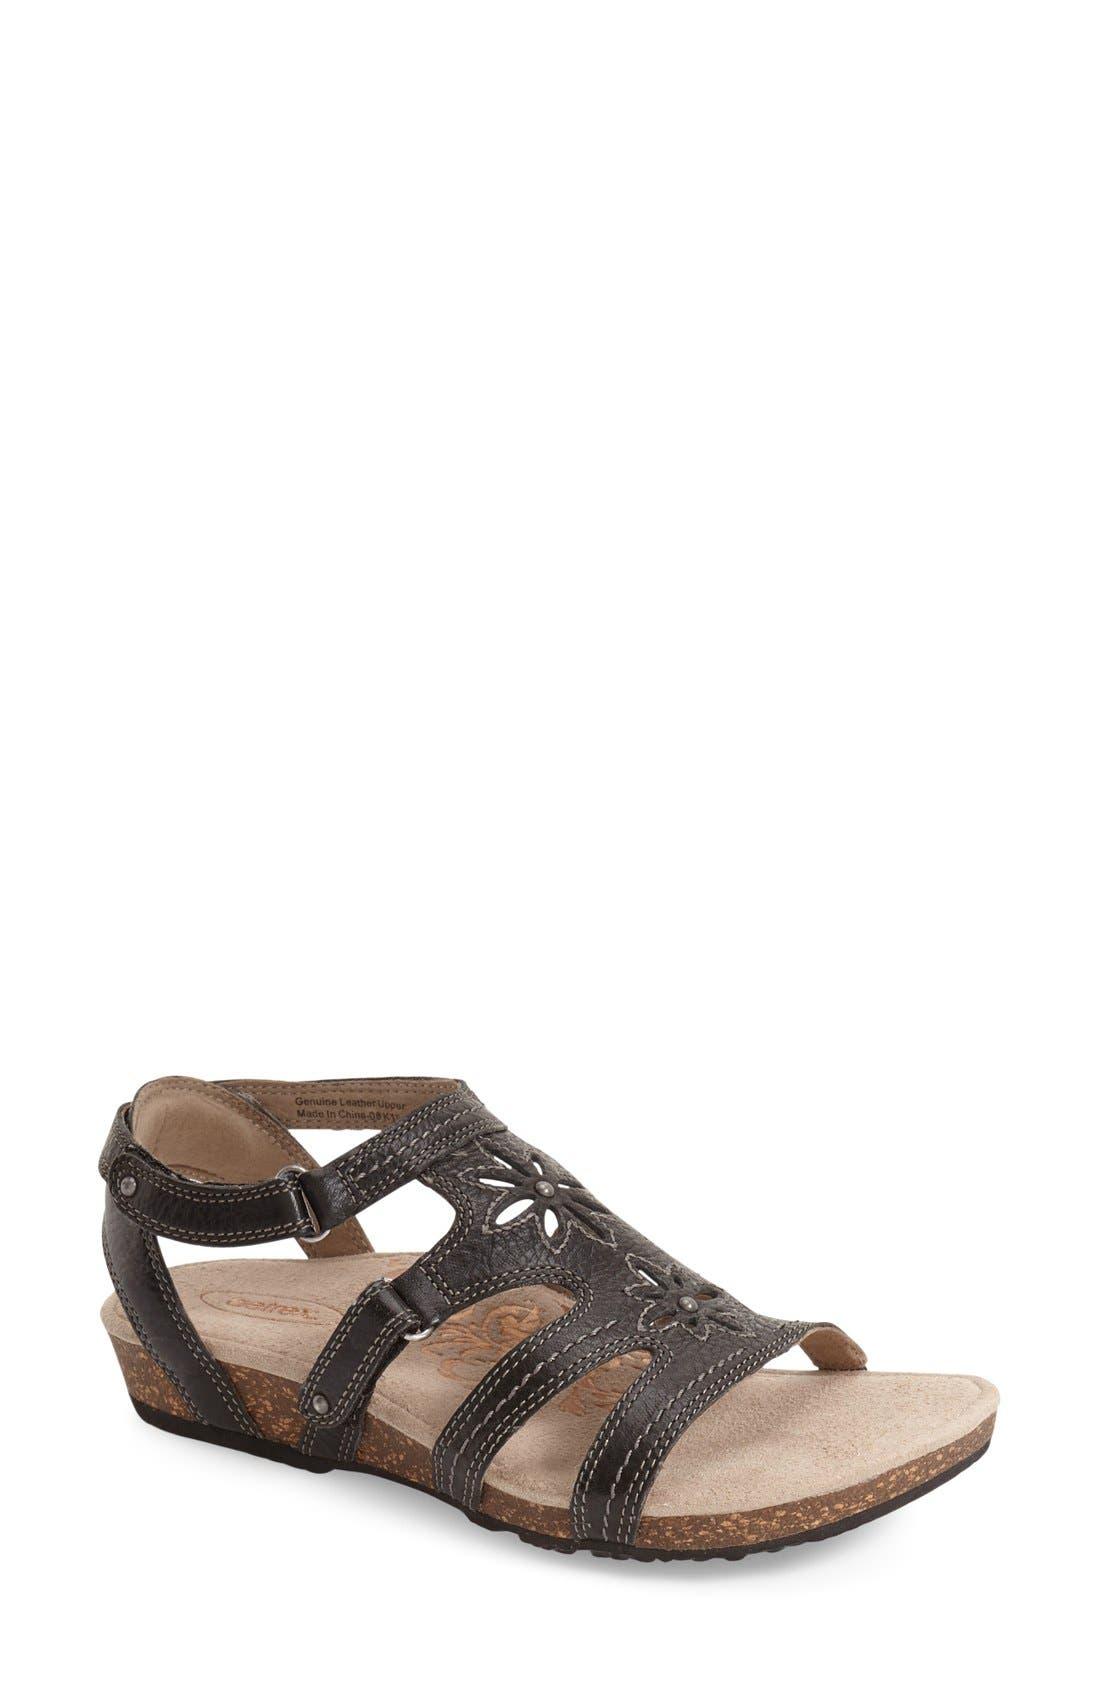 Main Image - Aetrex 'Natasha' Gladiator Sandal (Women)